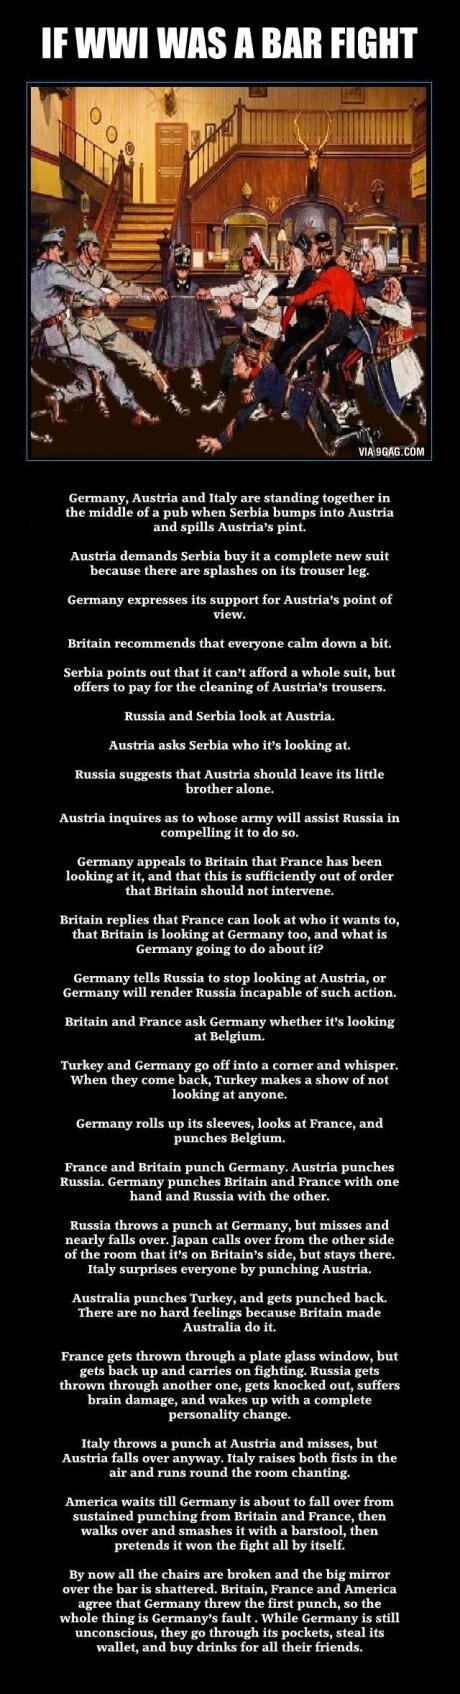 if world war I was a bar fight